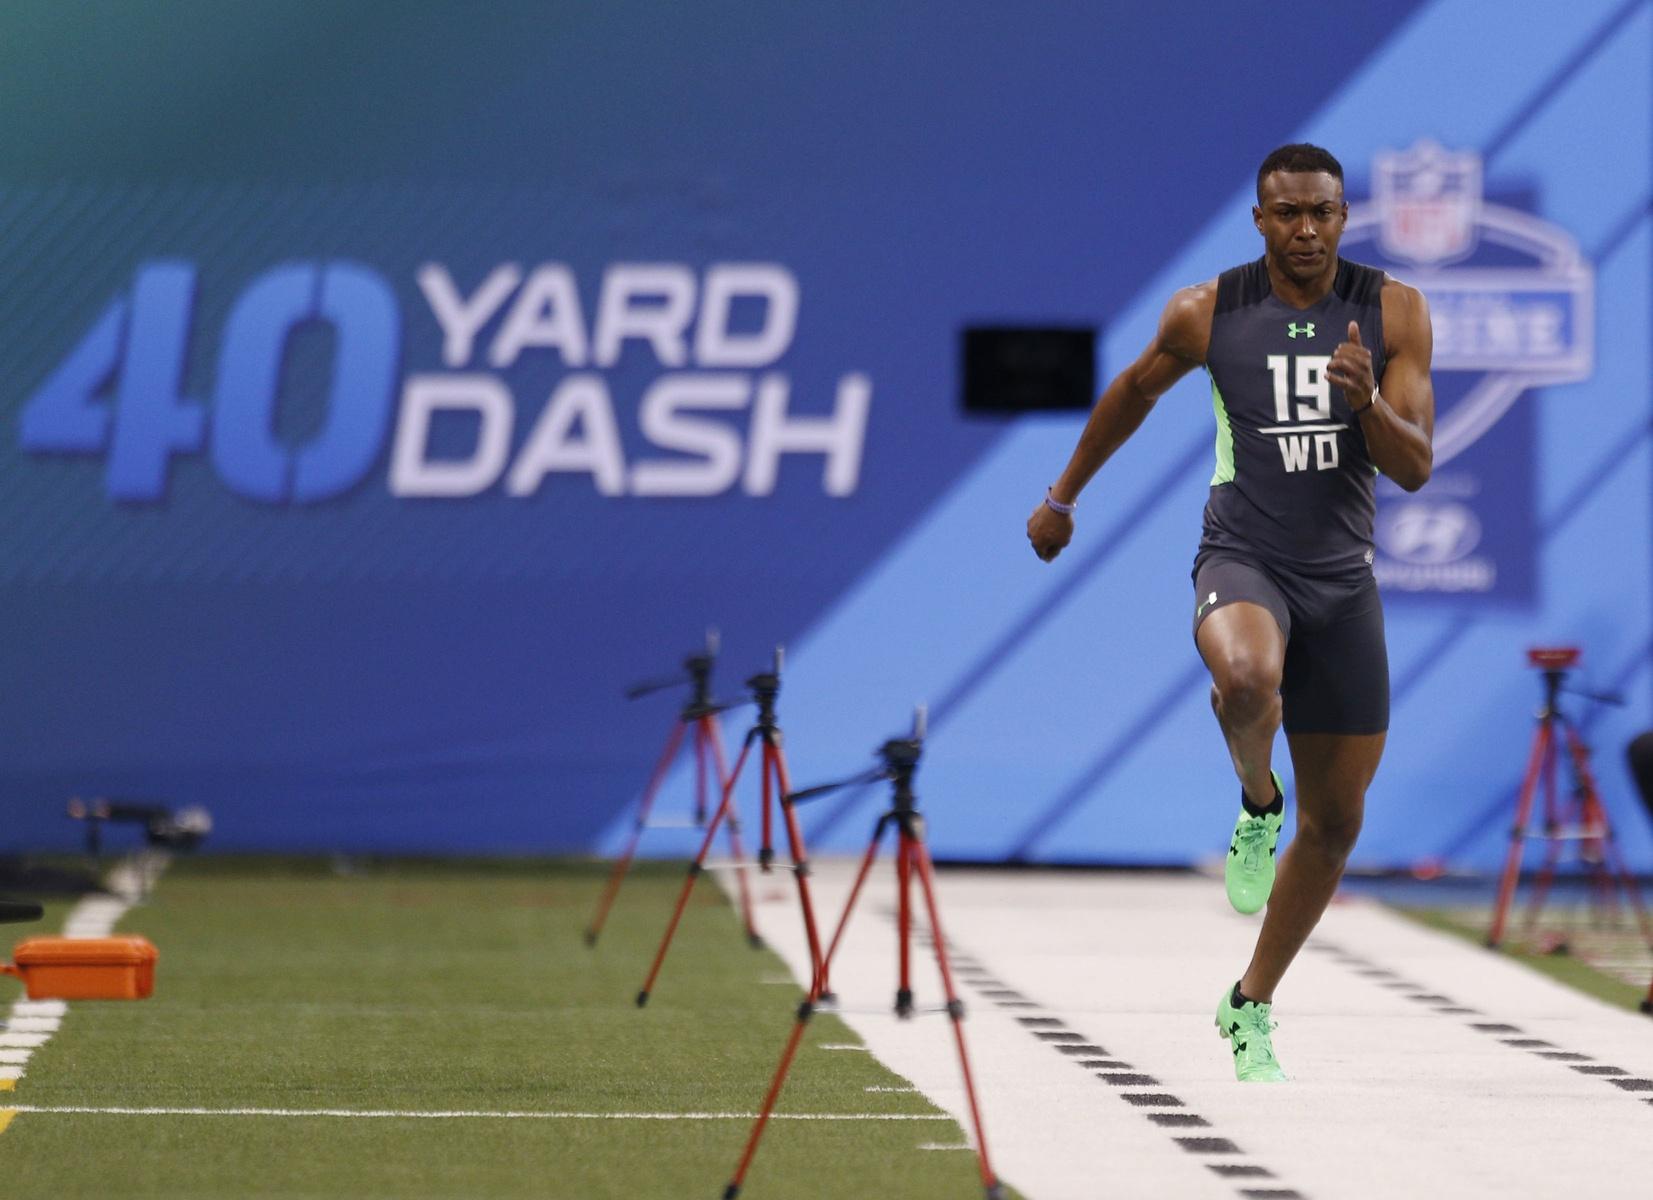 Adidas, NFL Combine